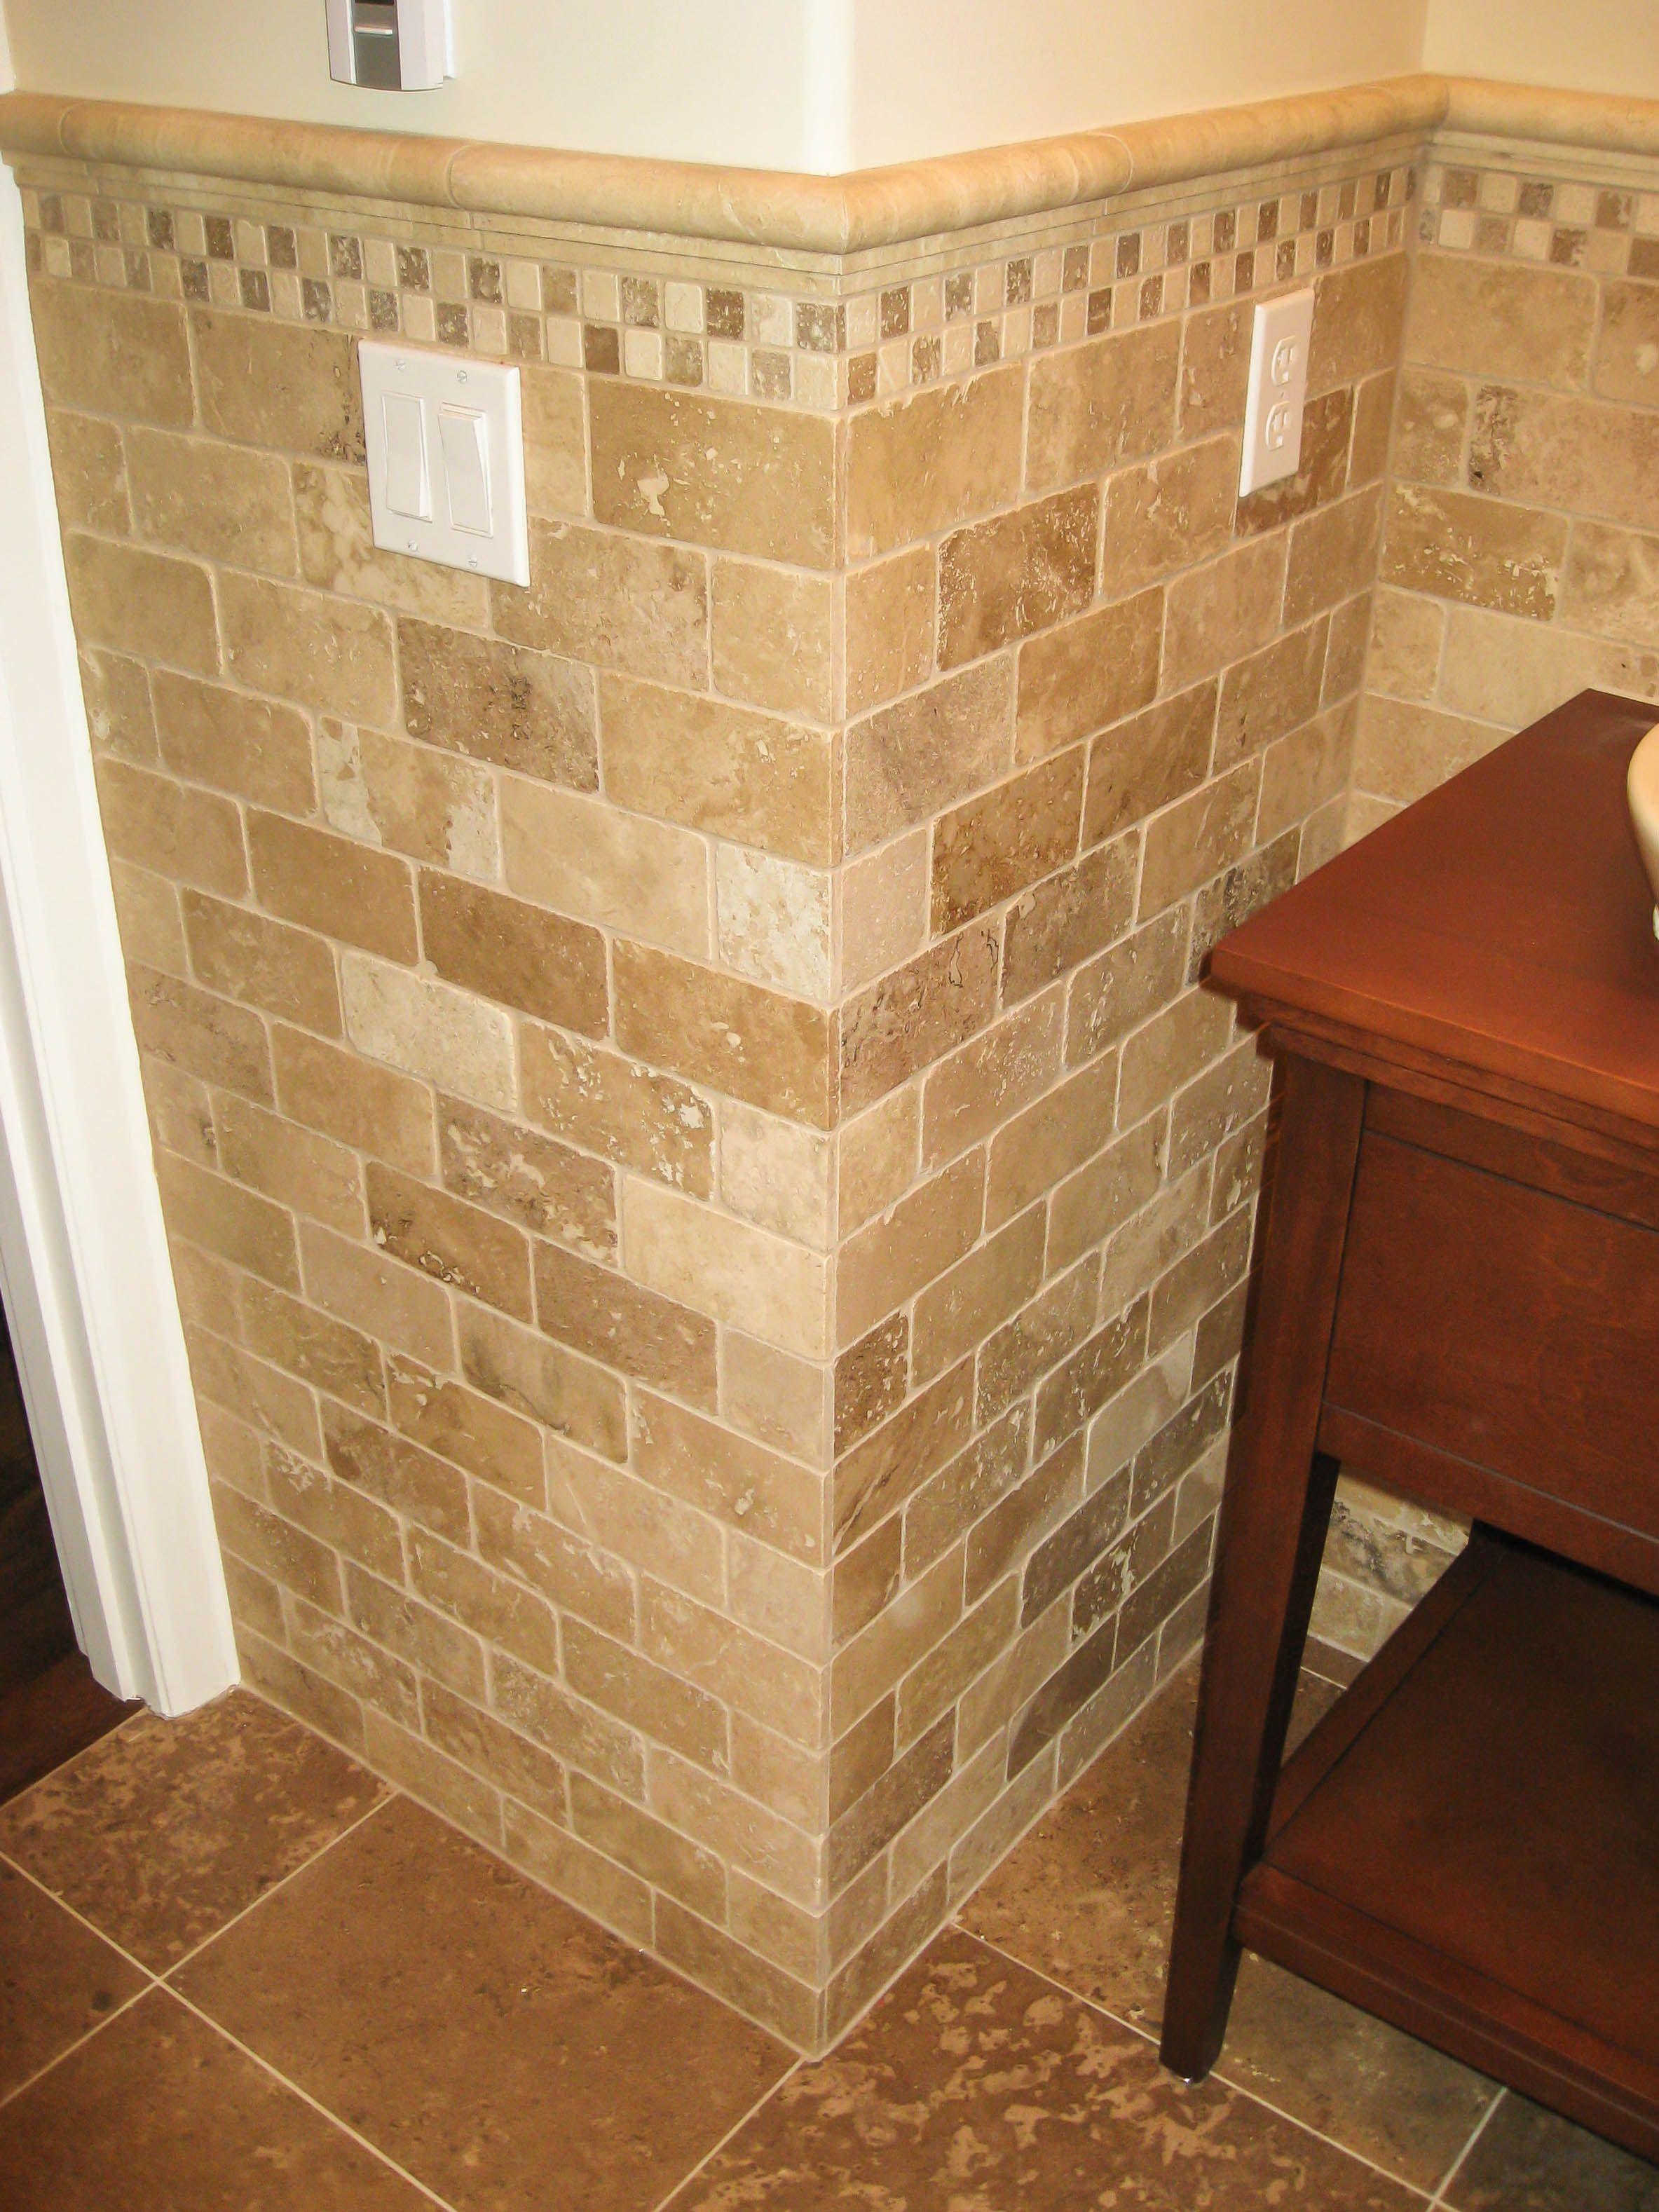 Bathroom Tile Wainscoting Ideasbathroom Tile and